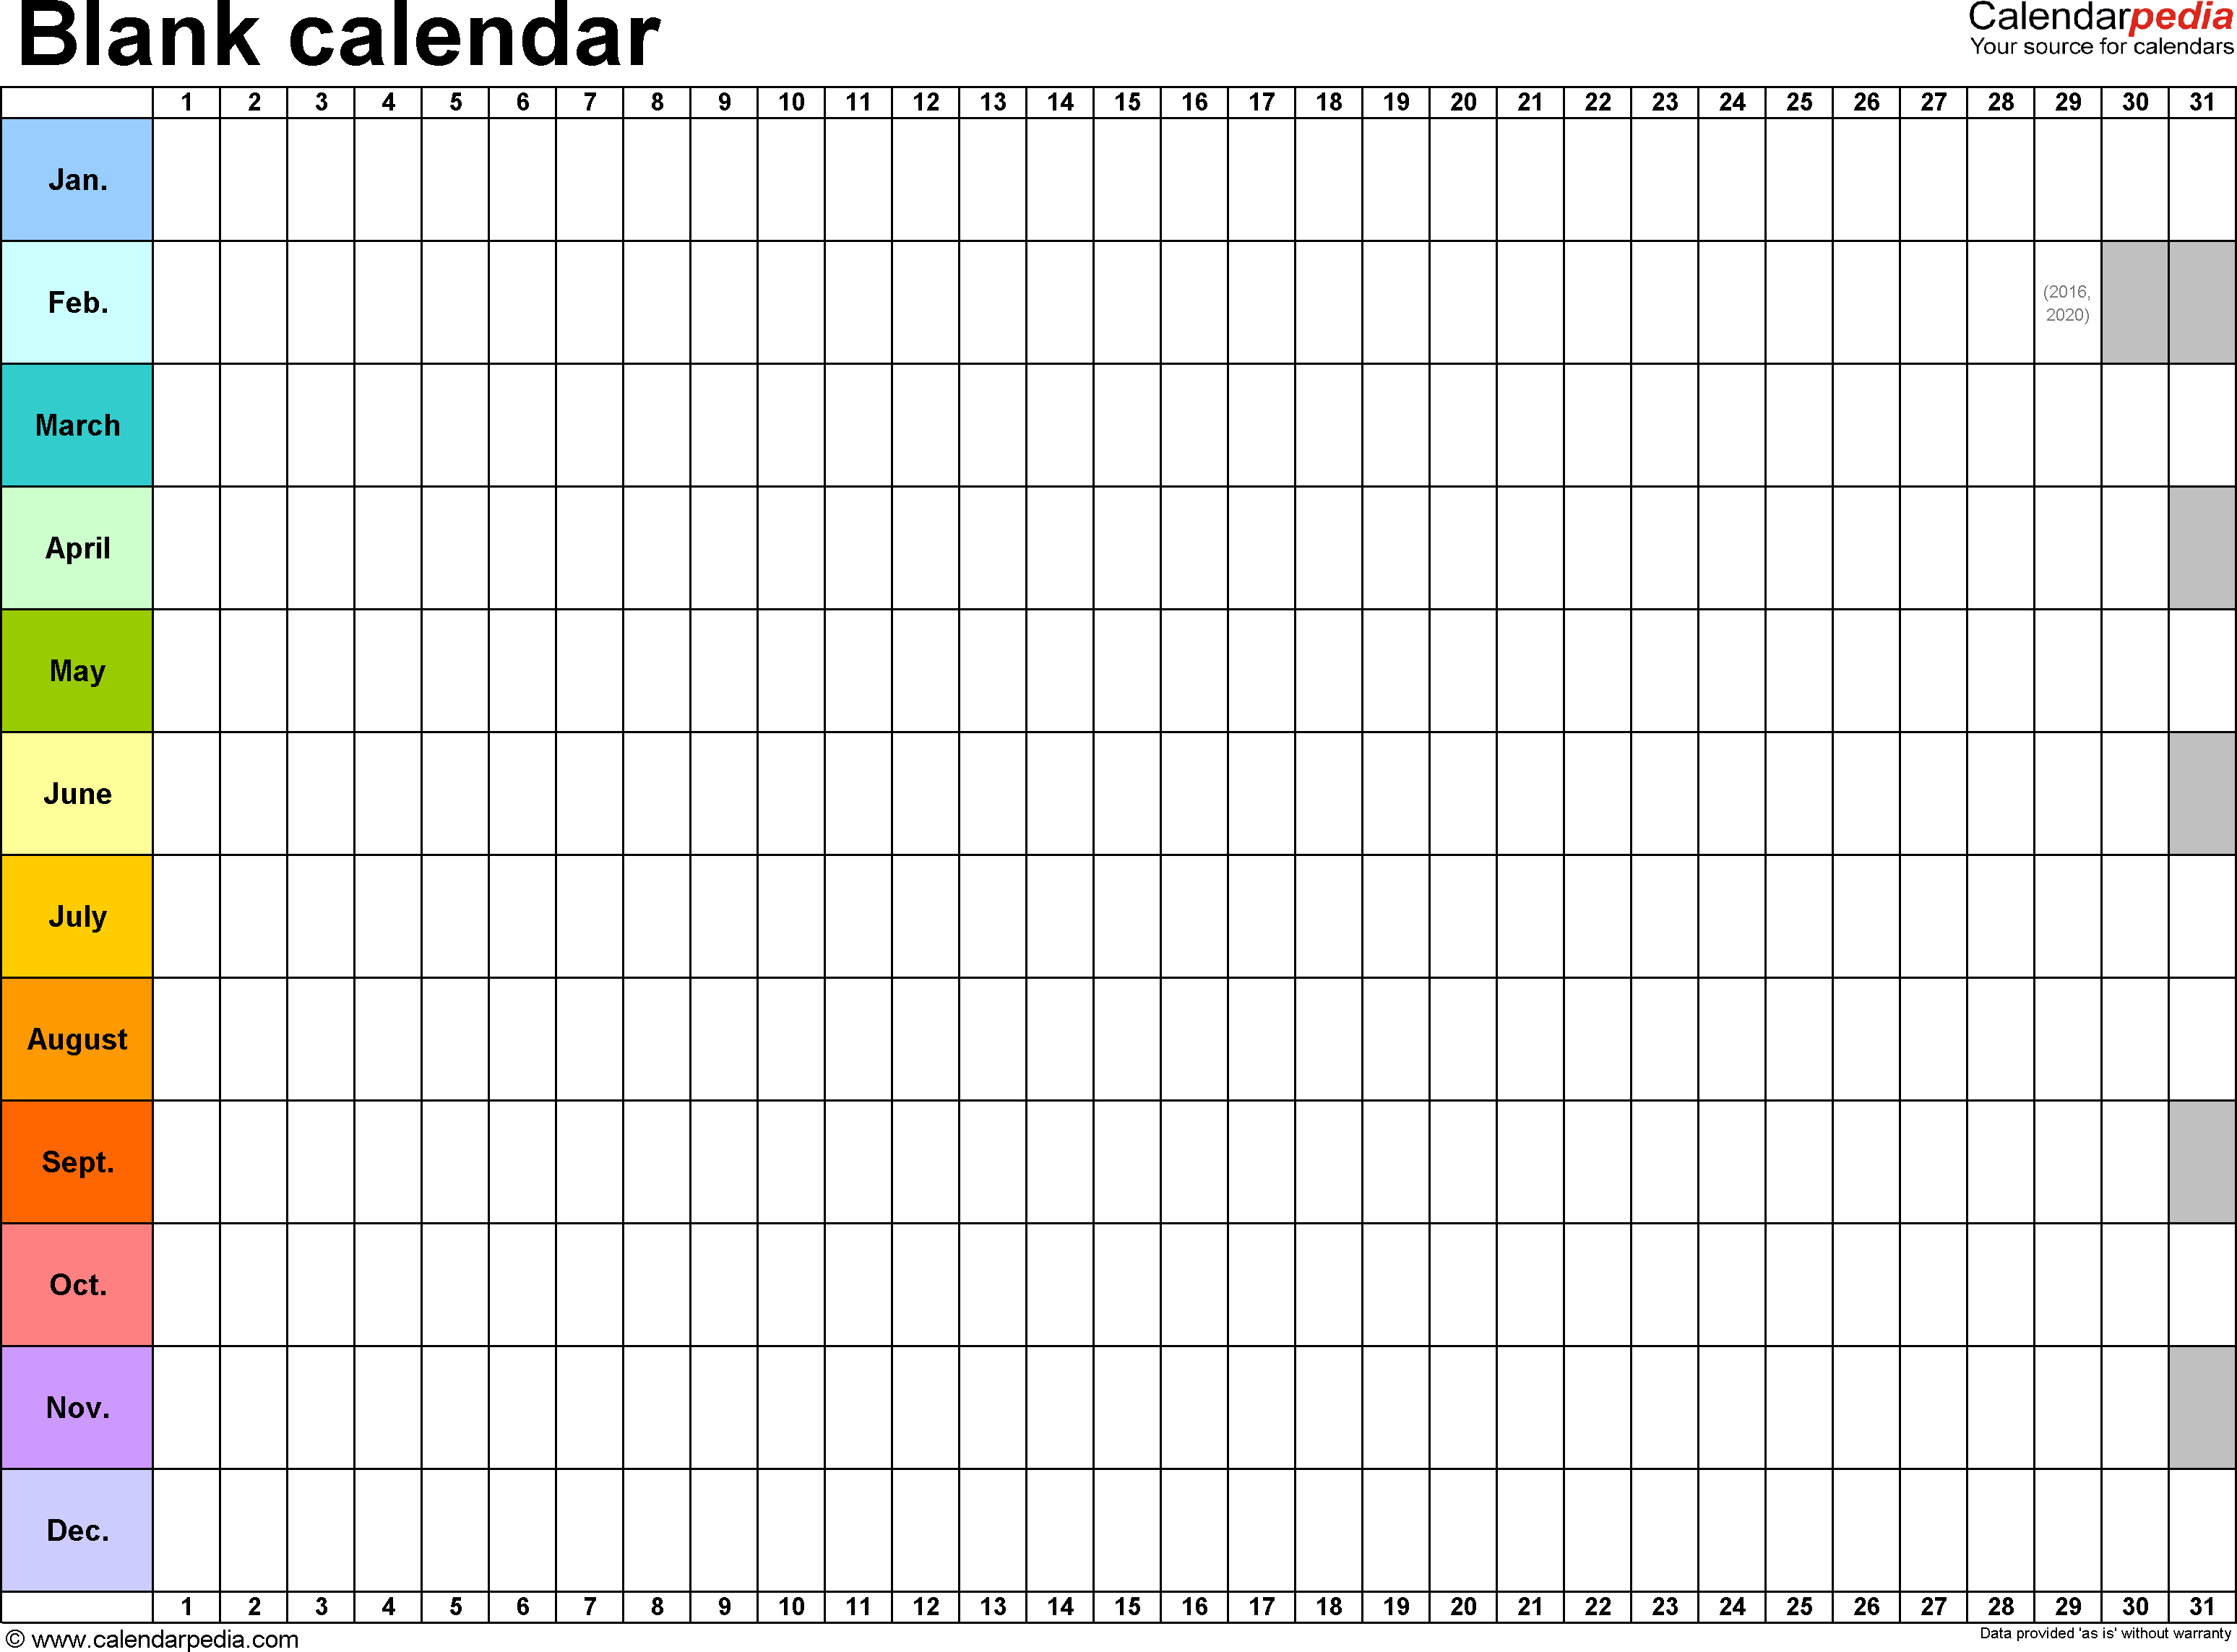 Template 2: Excel Template For Blank Calendar (Landscape Orientation